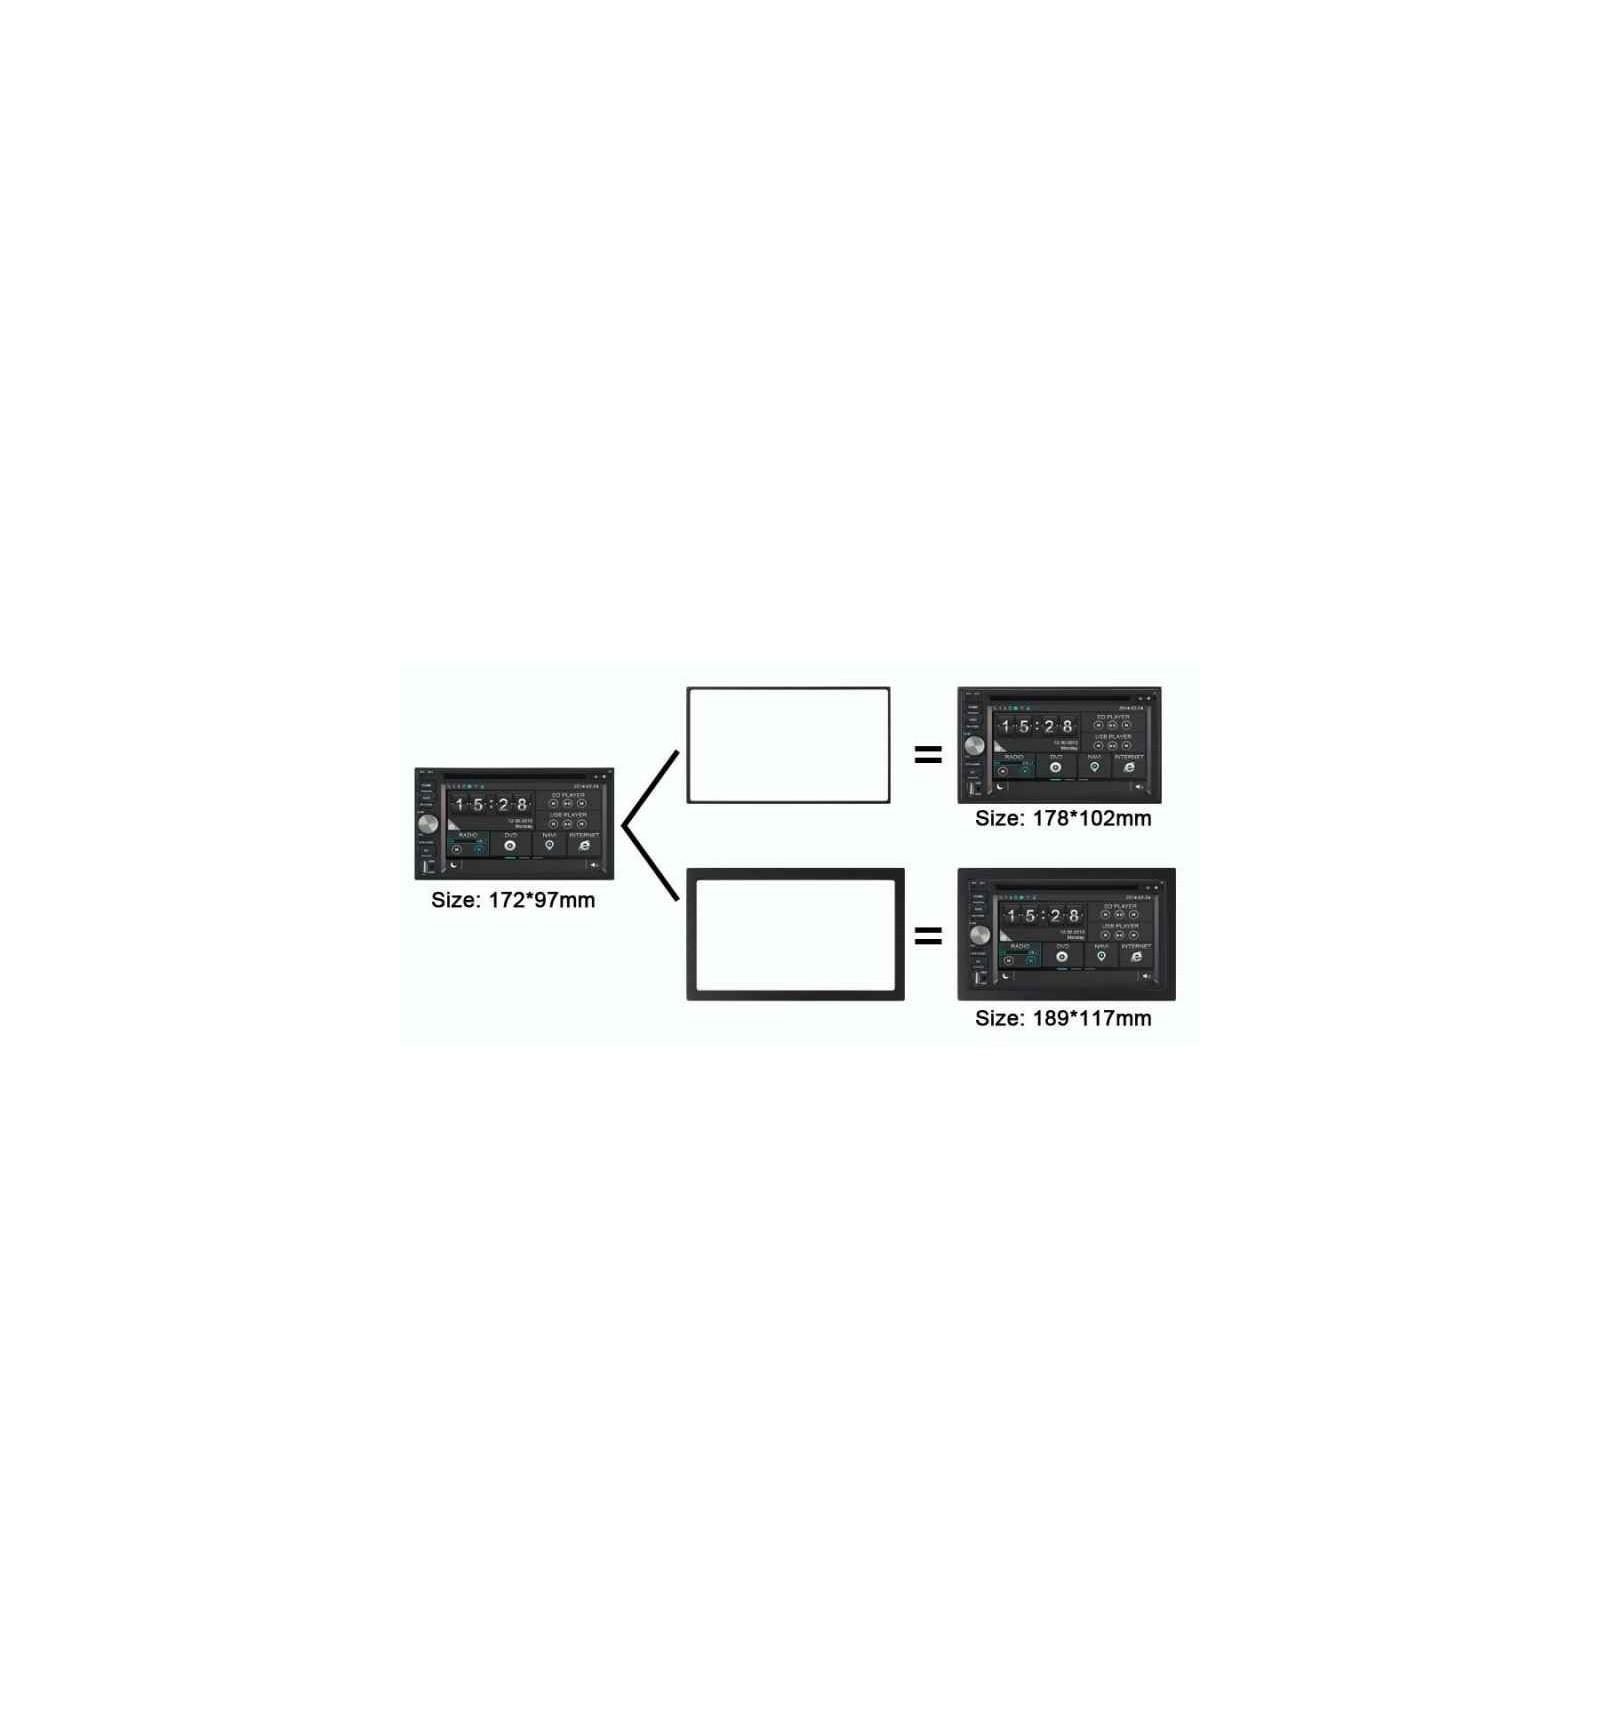 Activ USB / Lightning Cabelet Mono Gray 46901